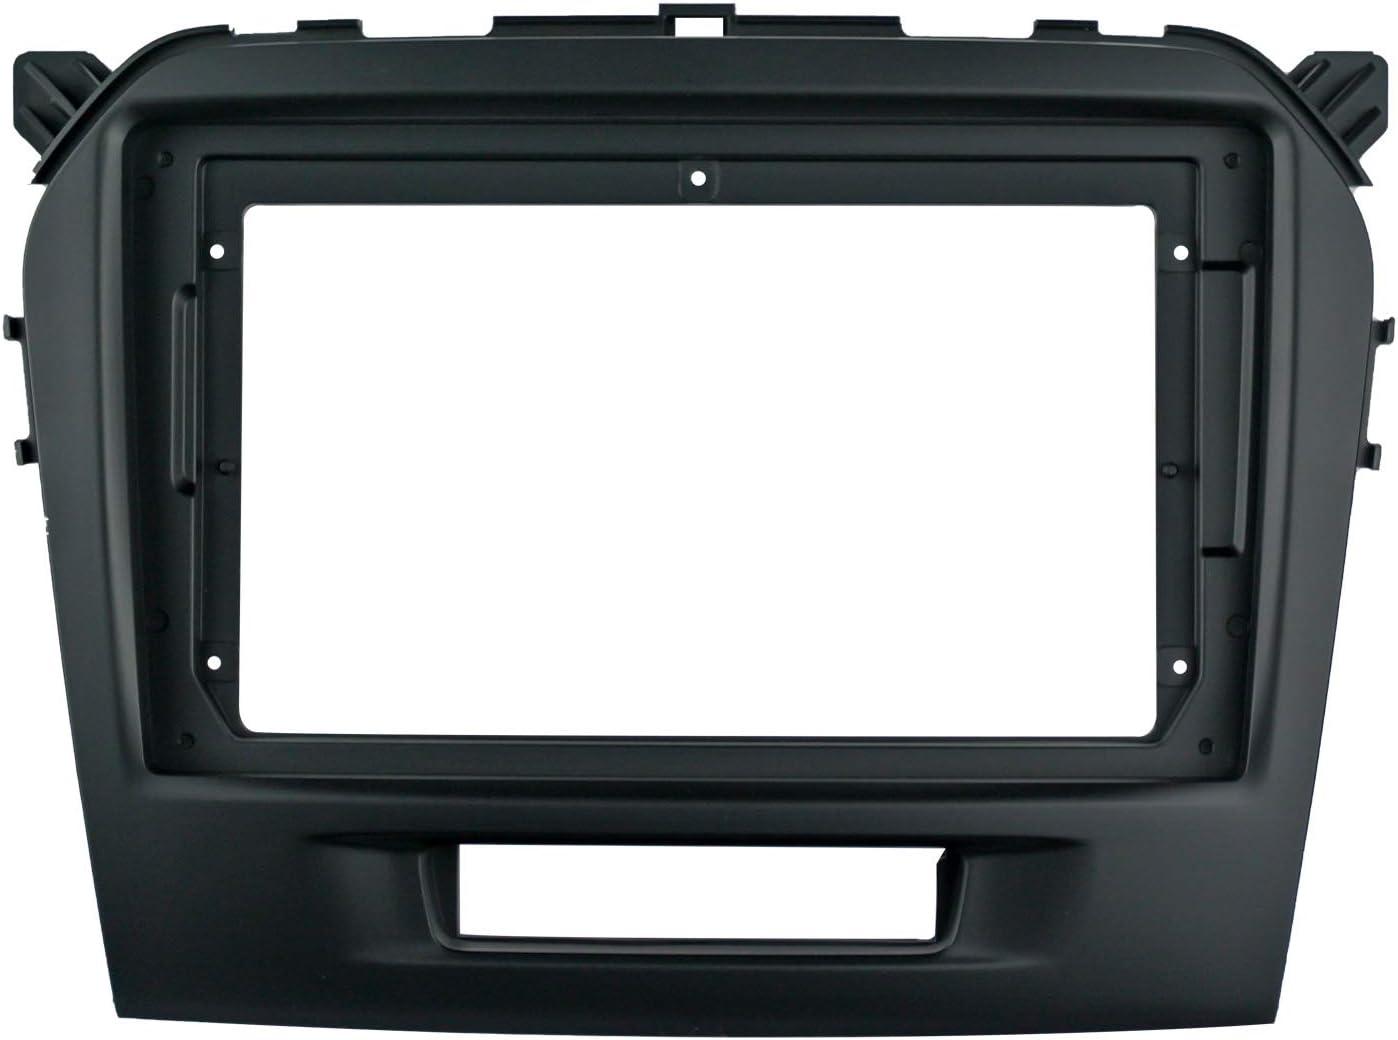 Frame Kits Double din 9inch car Stereo Dashboard Installation Kits Mounting Kits Aftermarket Kits for Suzuki Vitara 2015-2019 10-162